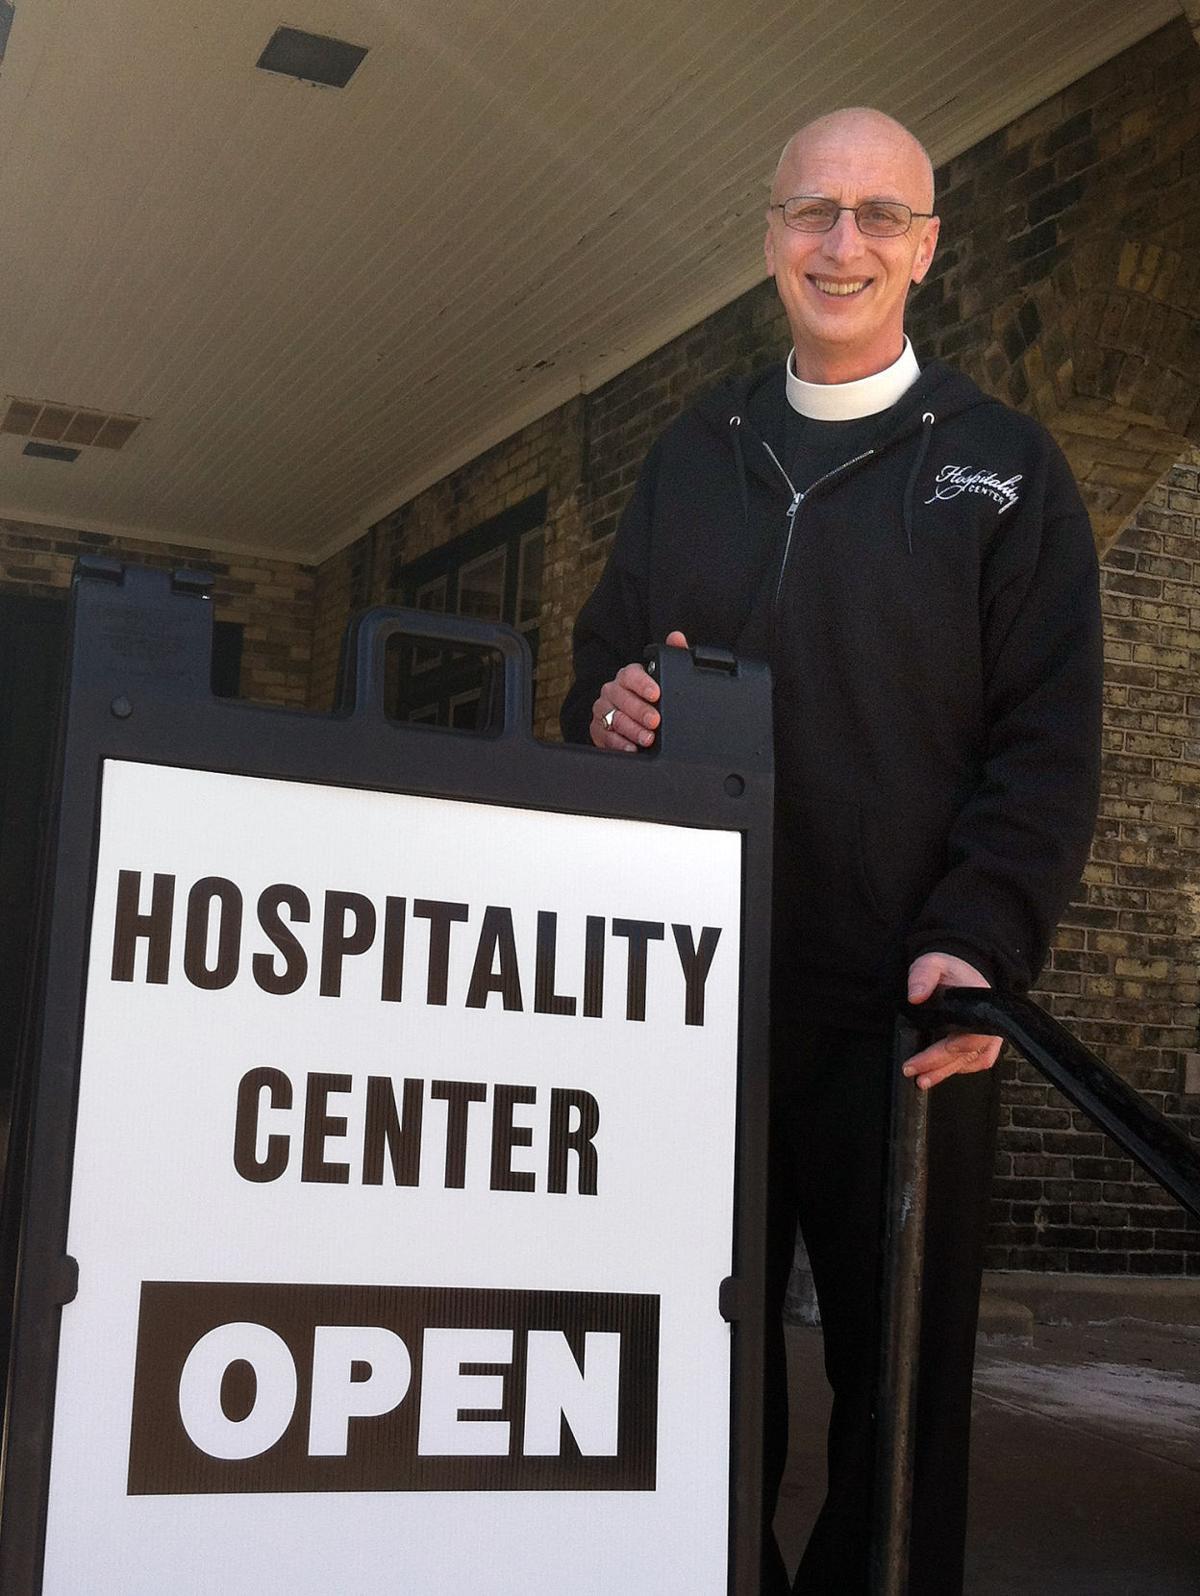 Hospitality Center 2